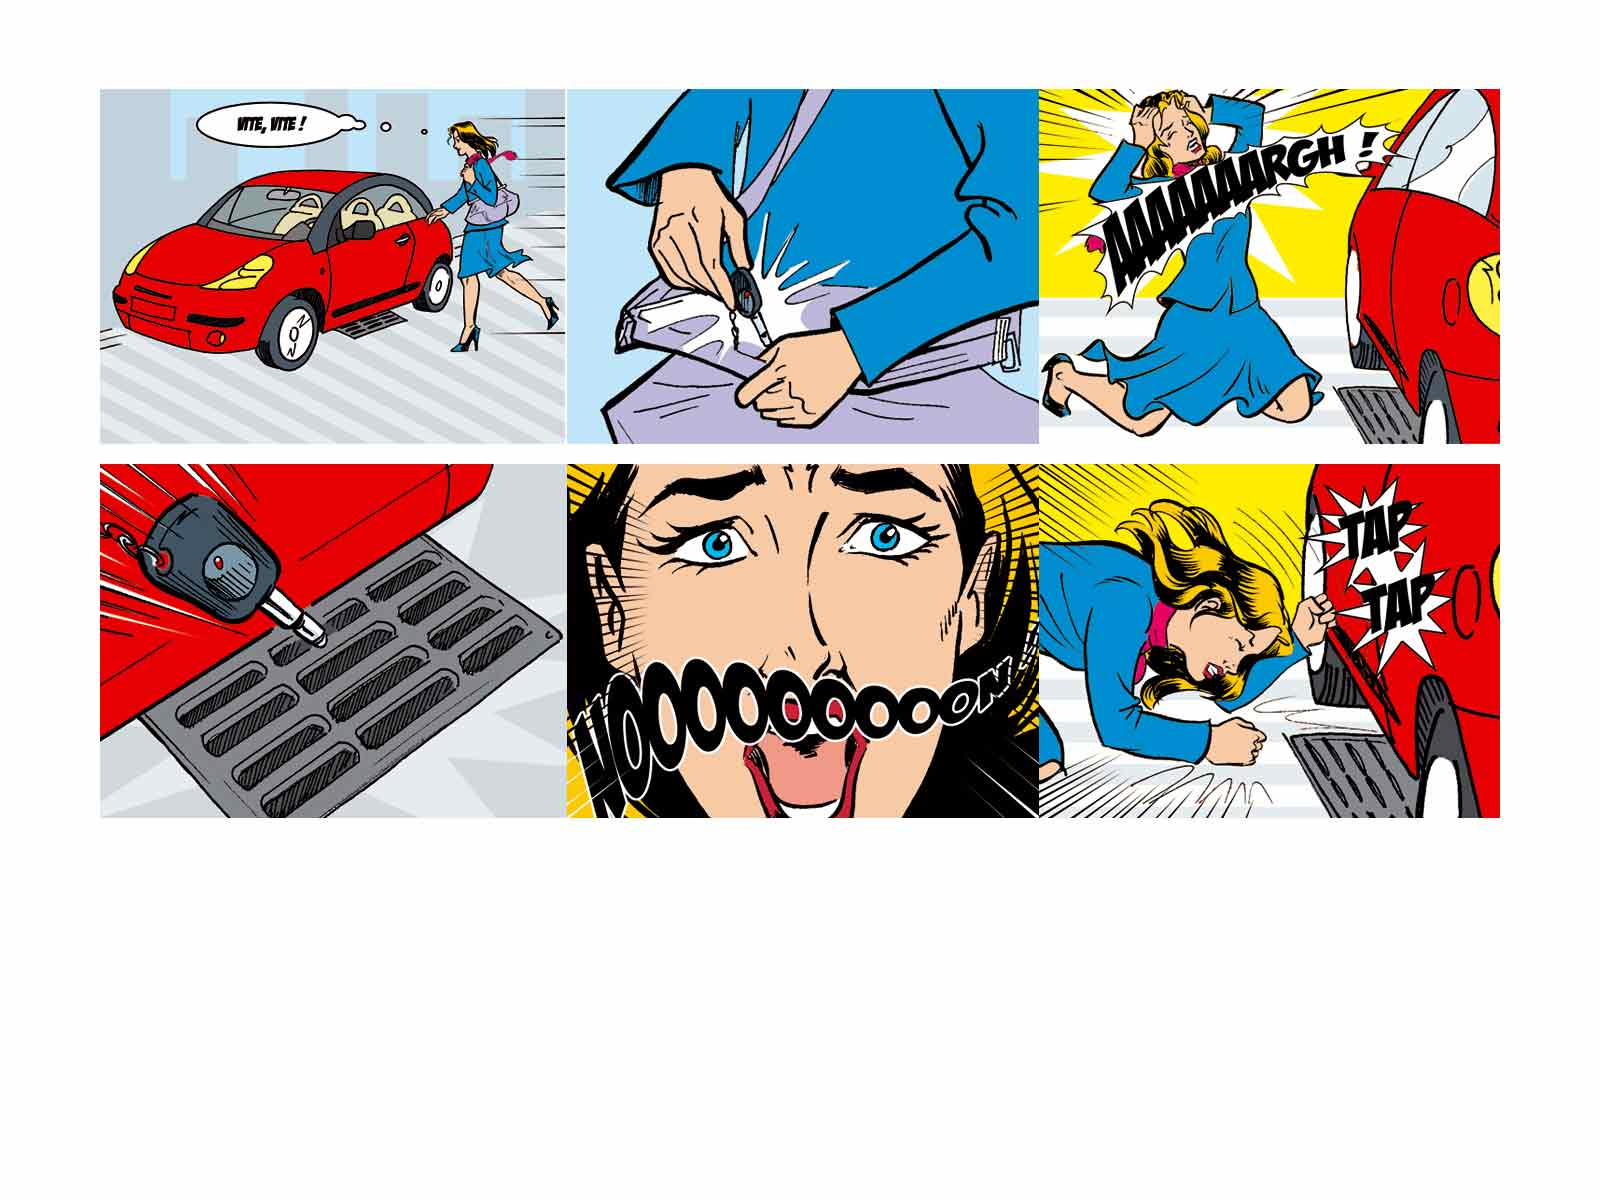 BEAUDENONThierry-Illustrations-STUDIO BD-253